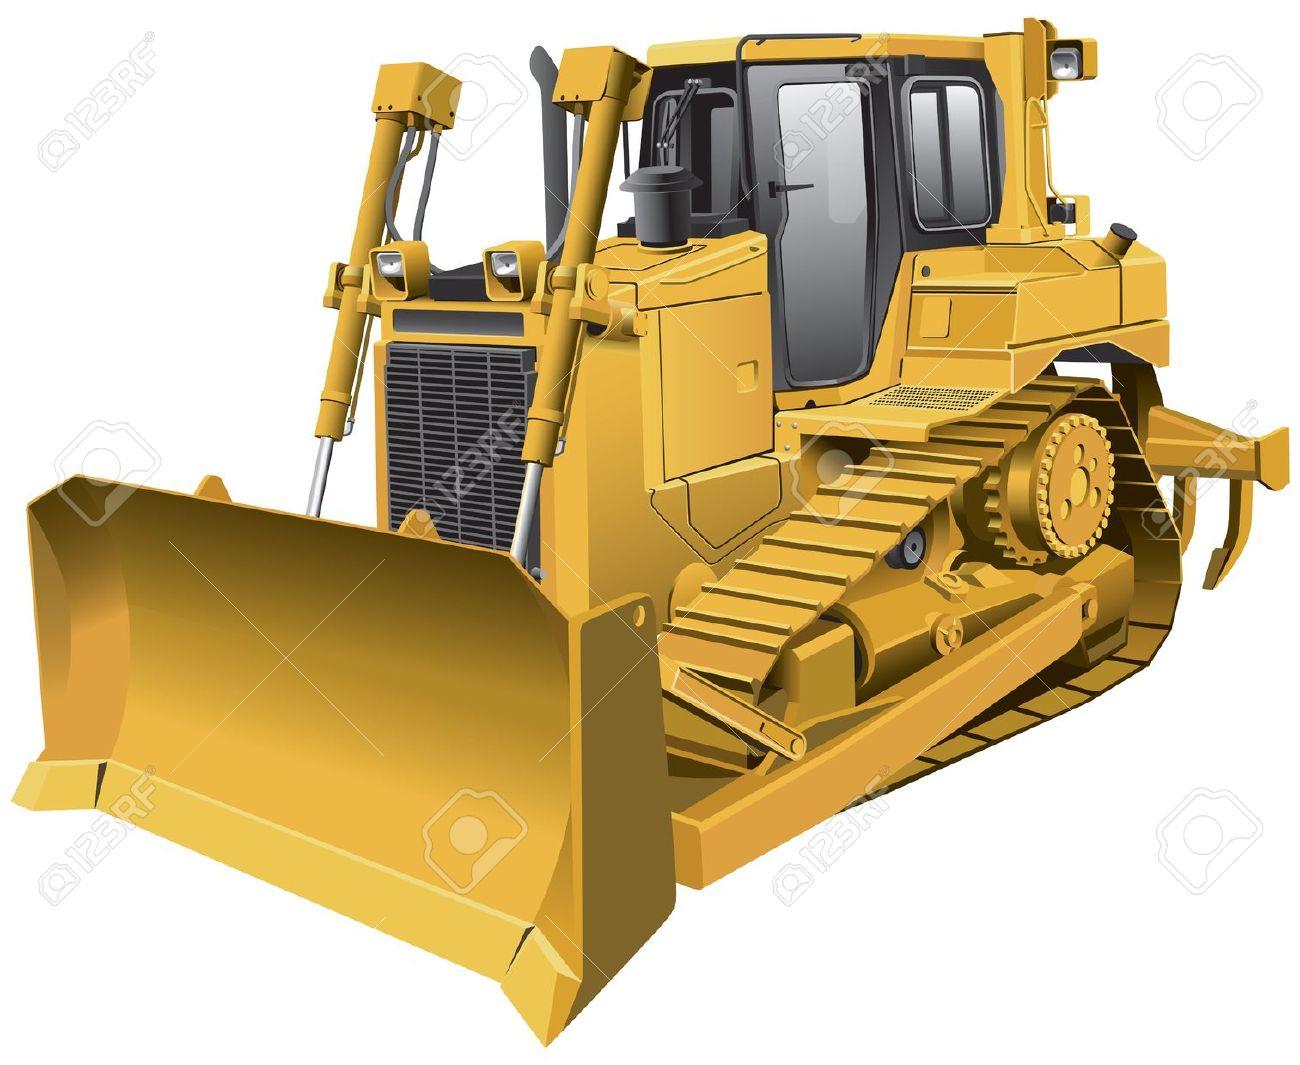 Caterpillar bulldozer clipart.